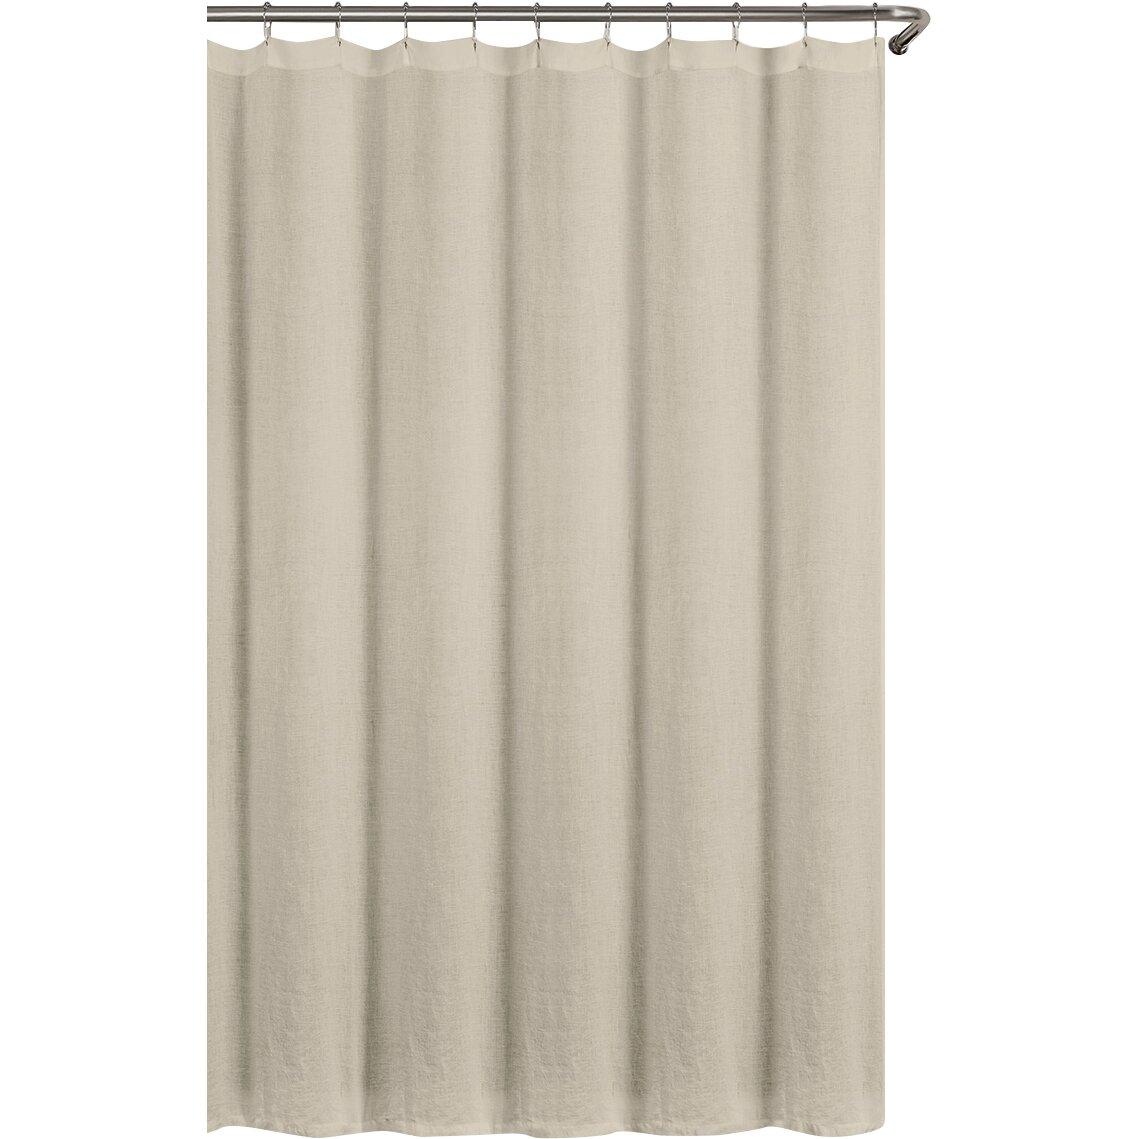 Echelon Home Washed Belgian Linen Shower Curtain & Reviews